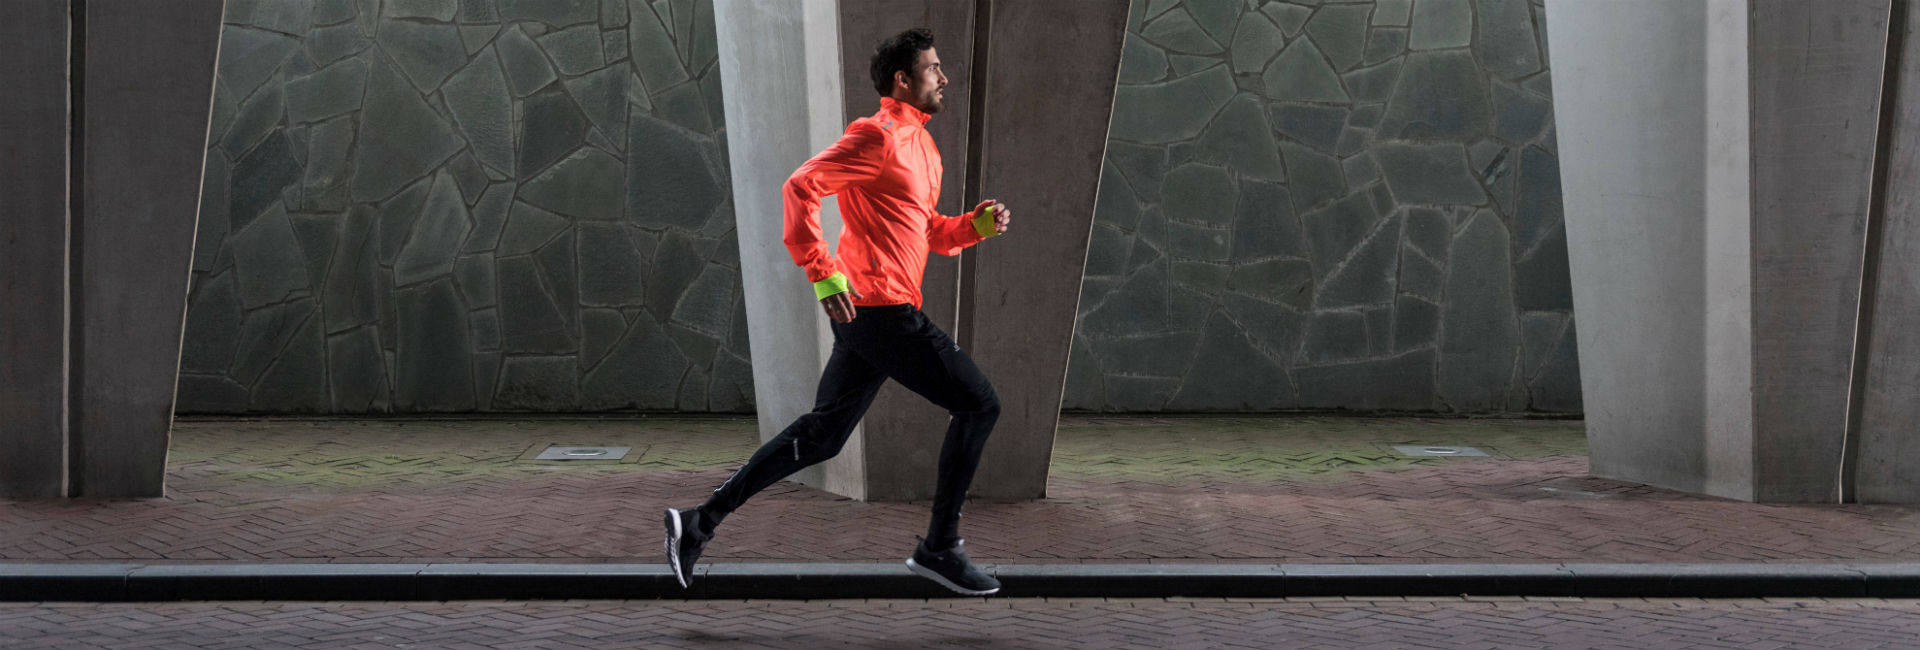 Mas/hrmax: How Should You Train